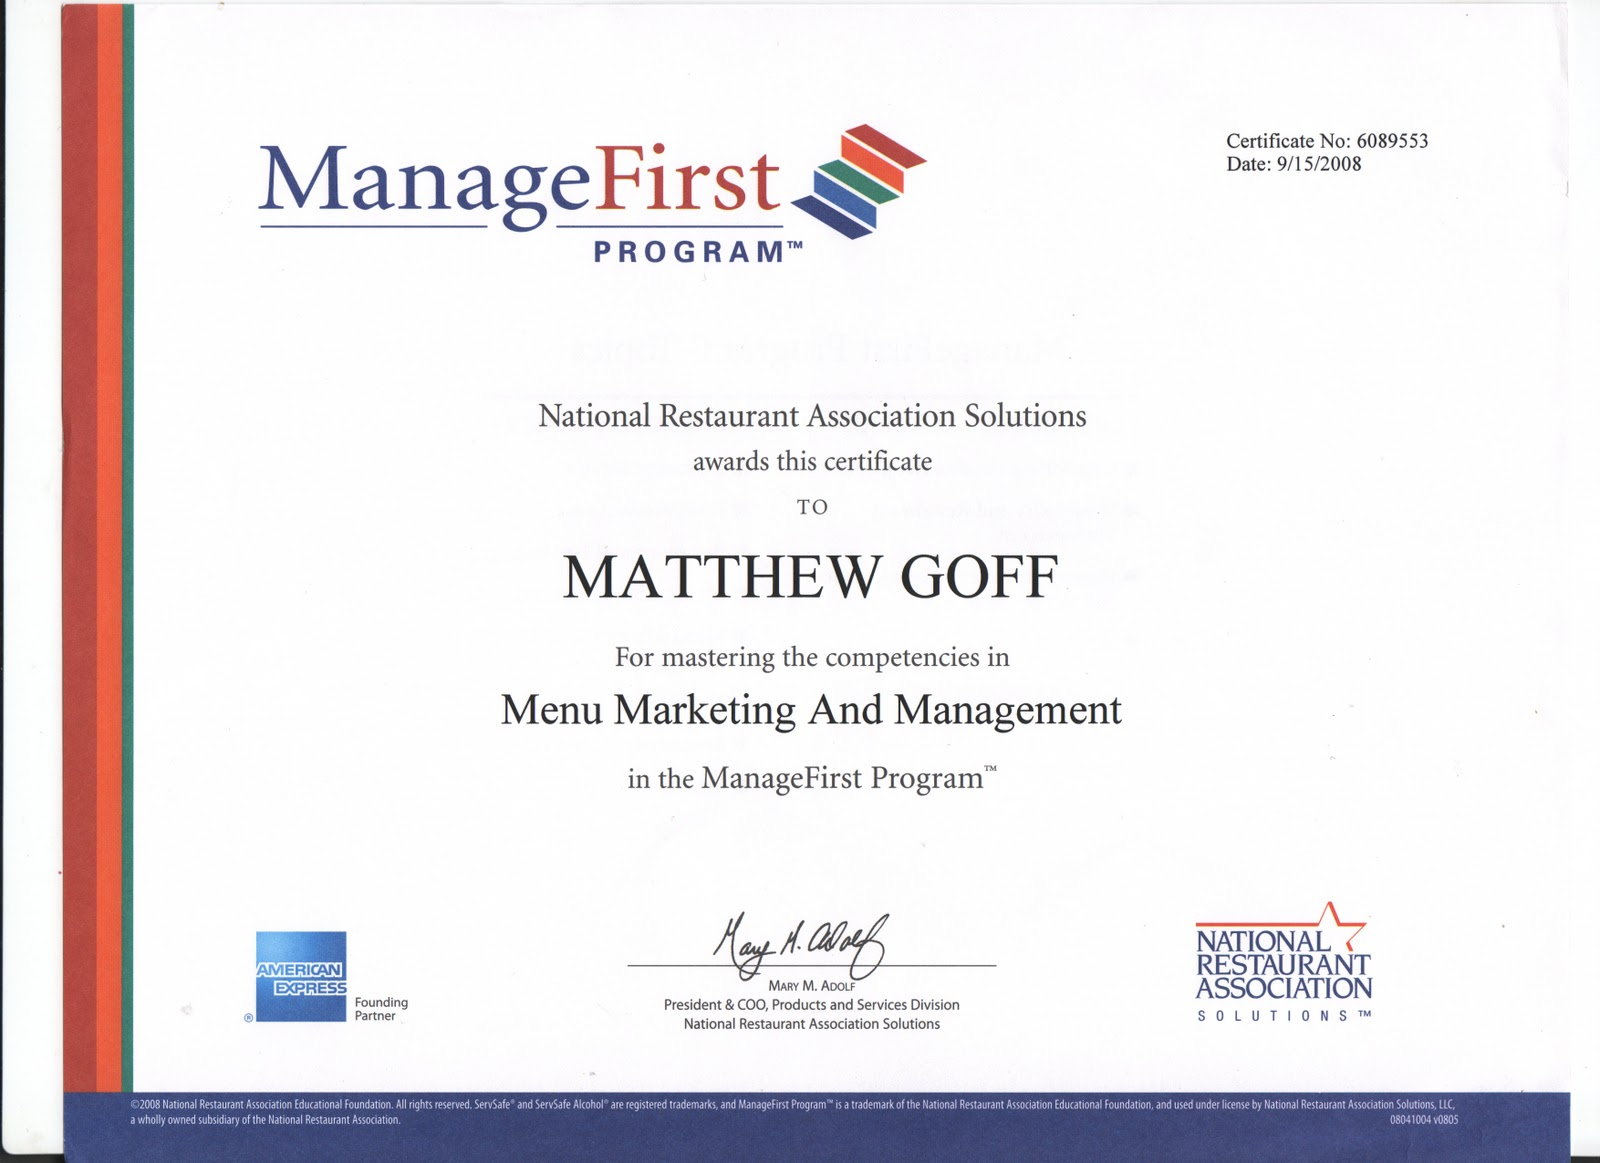 Matthew Goff\'s Portfolio: Certifications and Scholarships